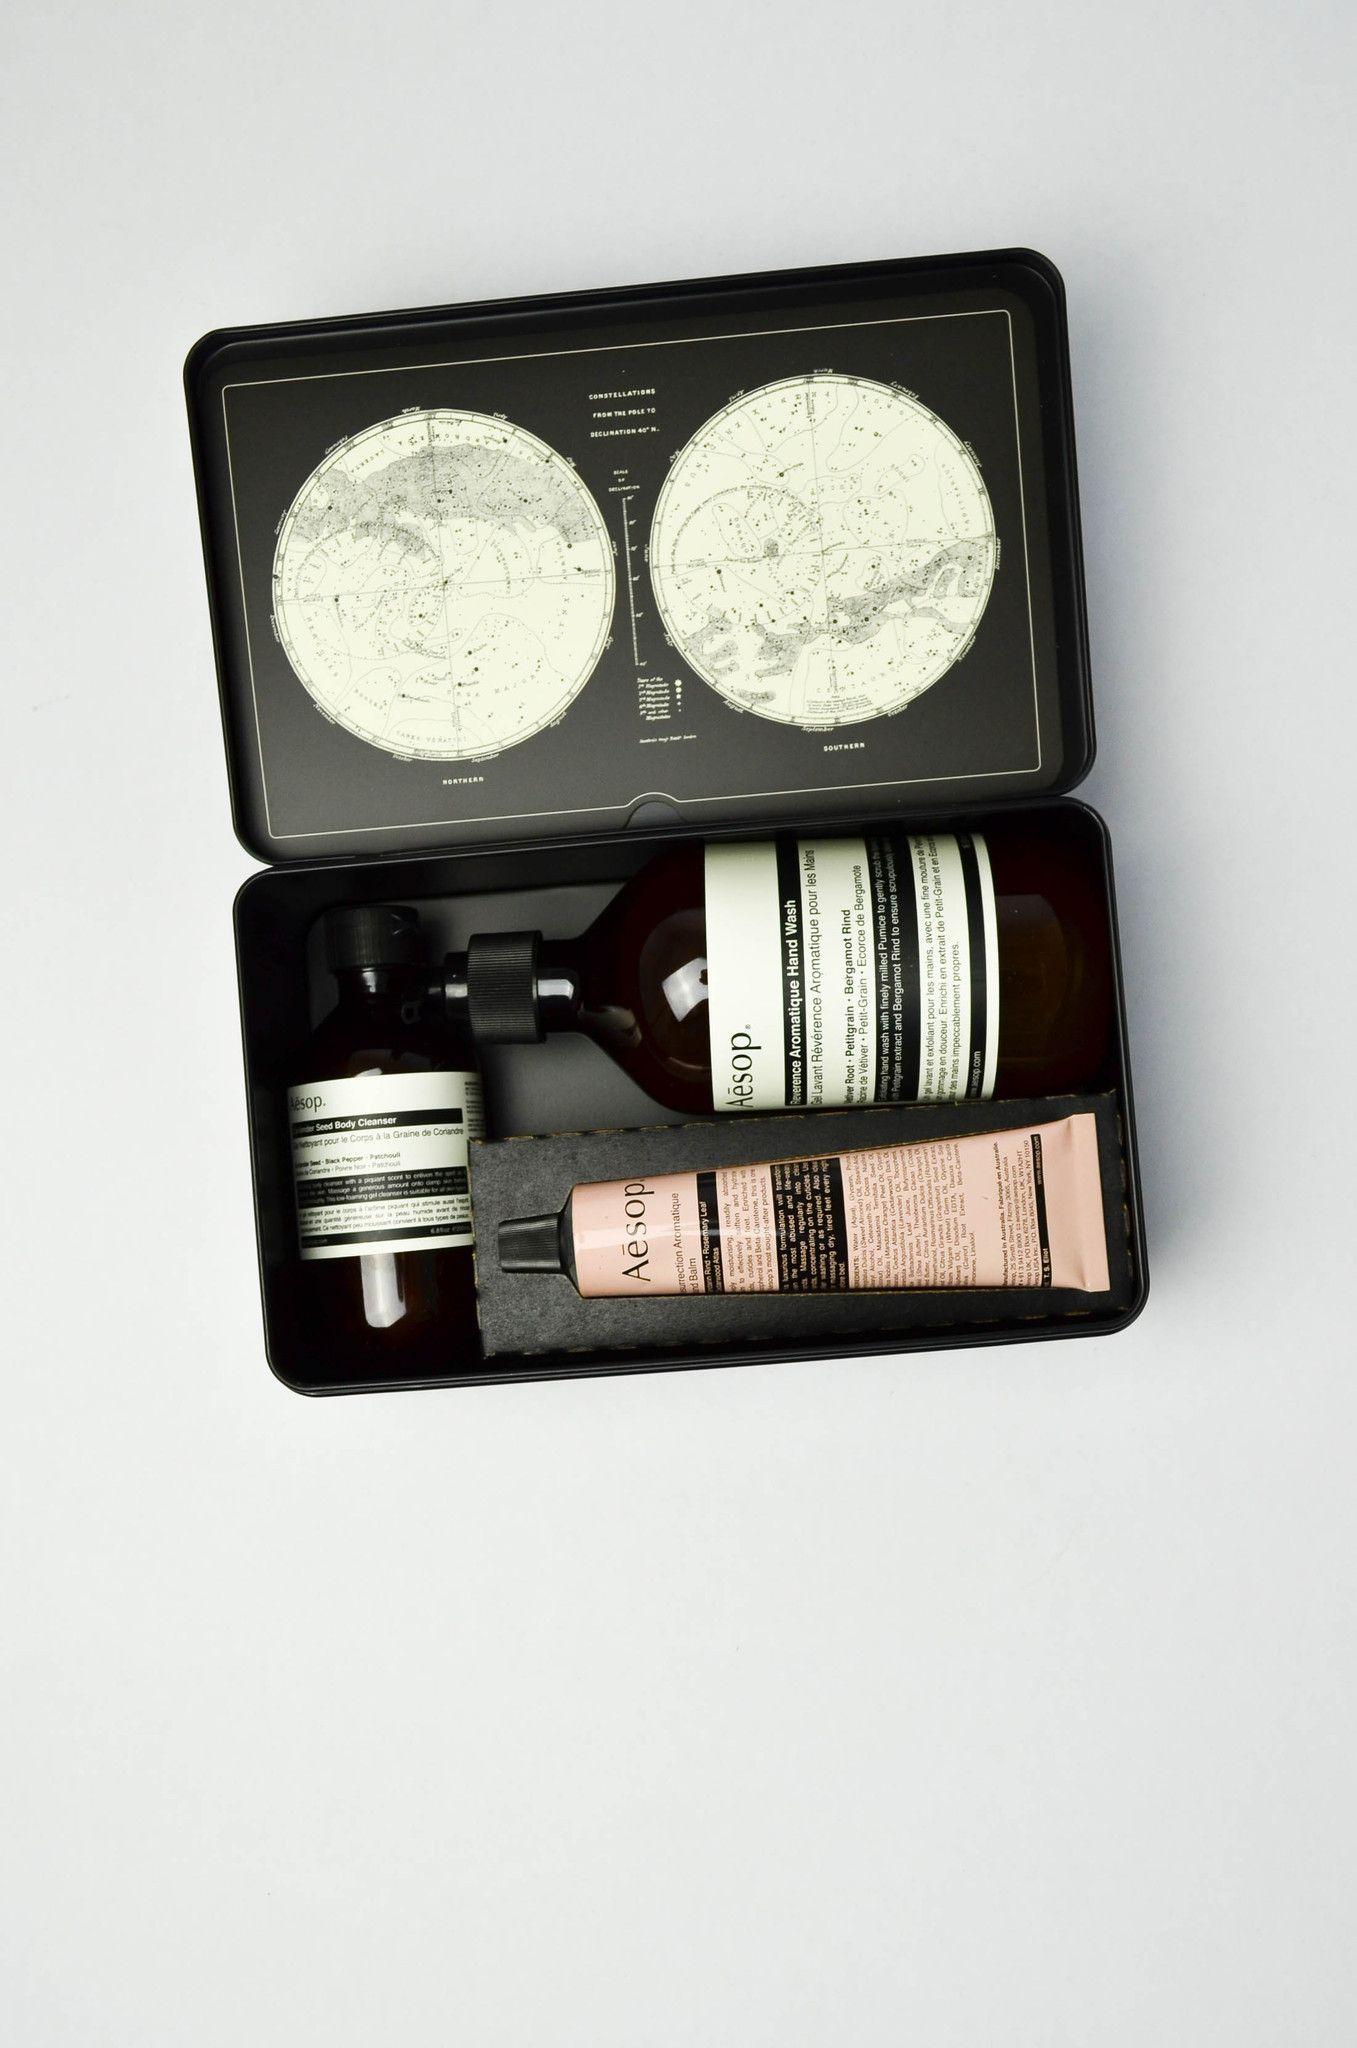 Aesop Andromeda Kit On Garmentory Hand Balm Body Cleanser The Balm